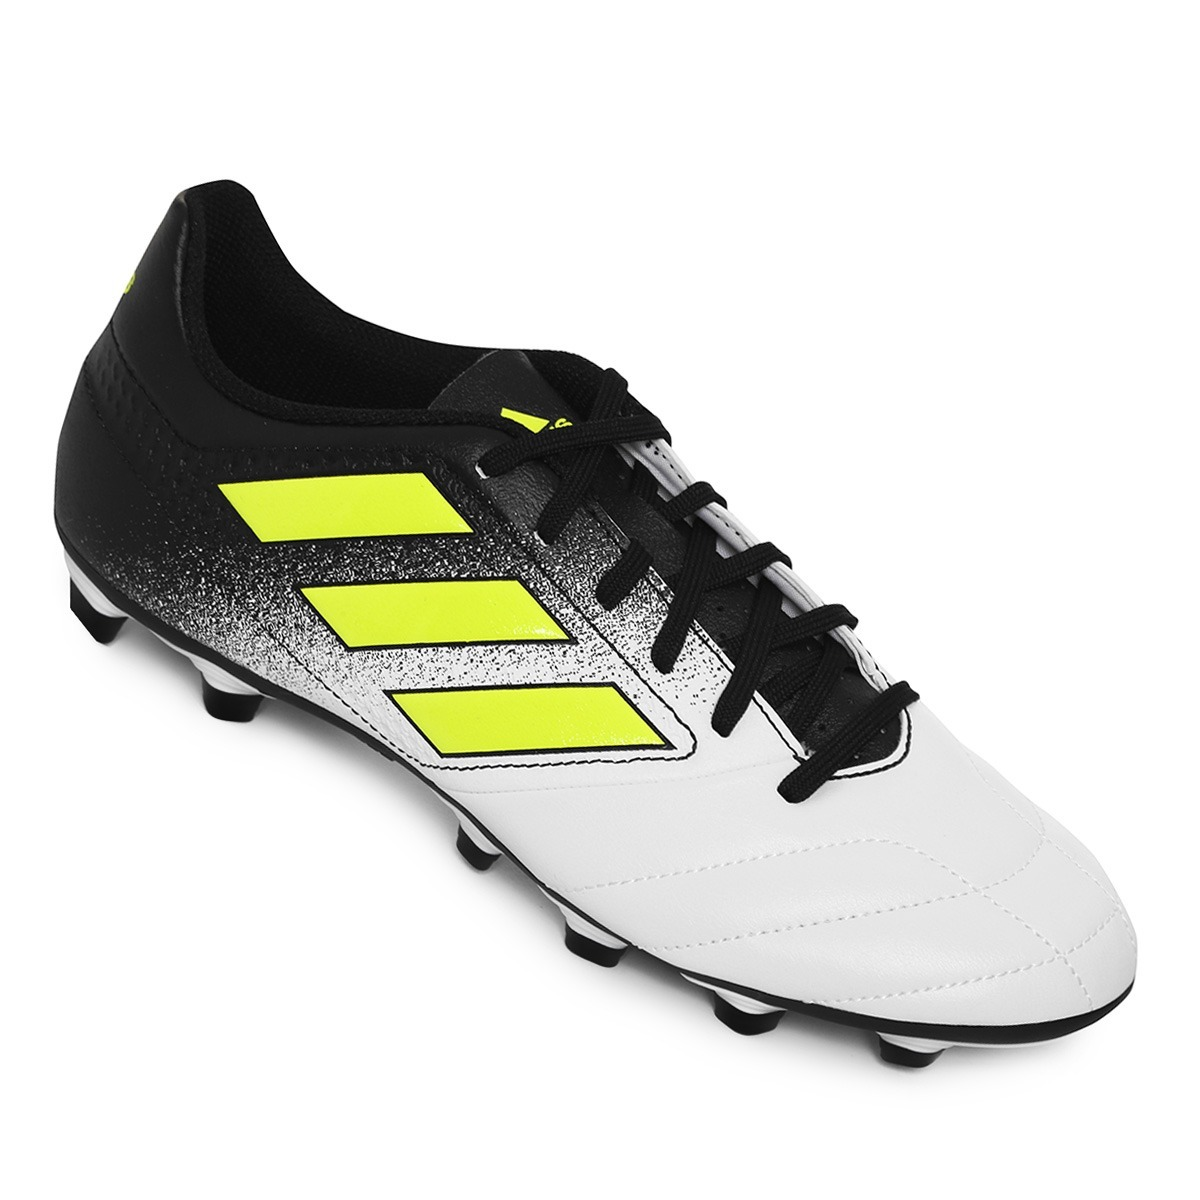 b1b4c7b9266bf zapatos de futbol adidas ace 17.4 fg blanco-negro. Cargando zoom.